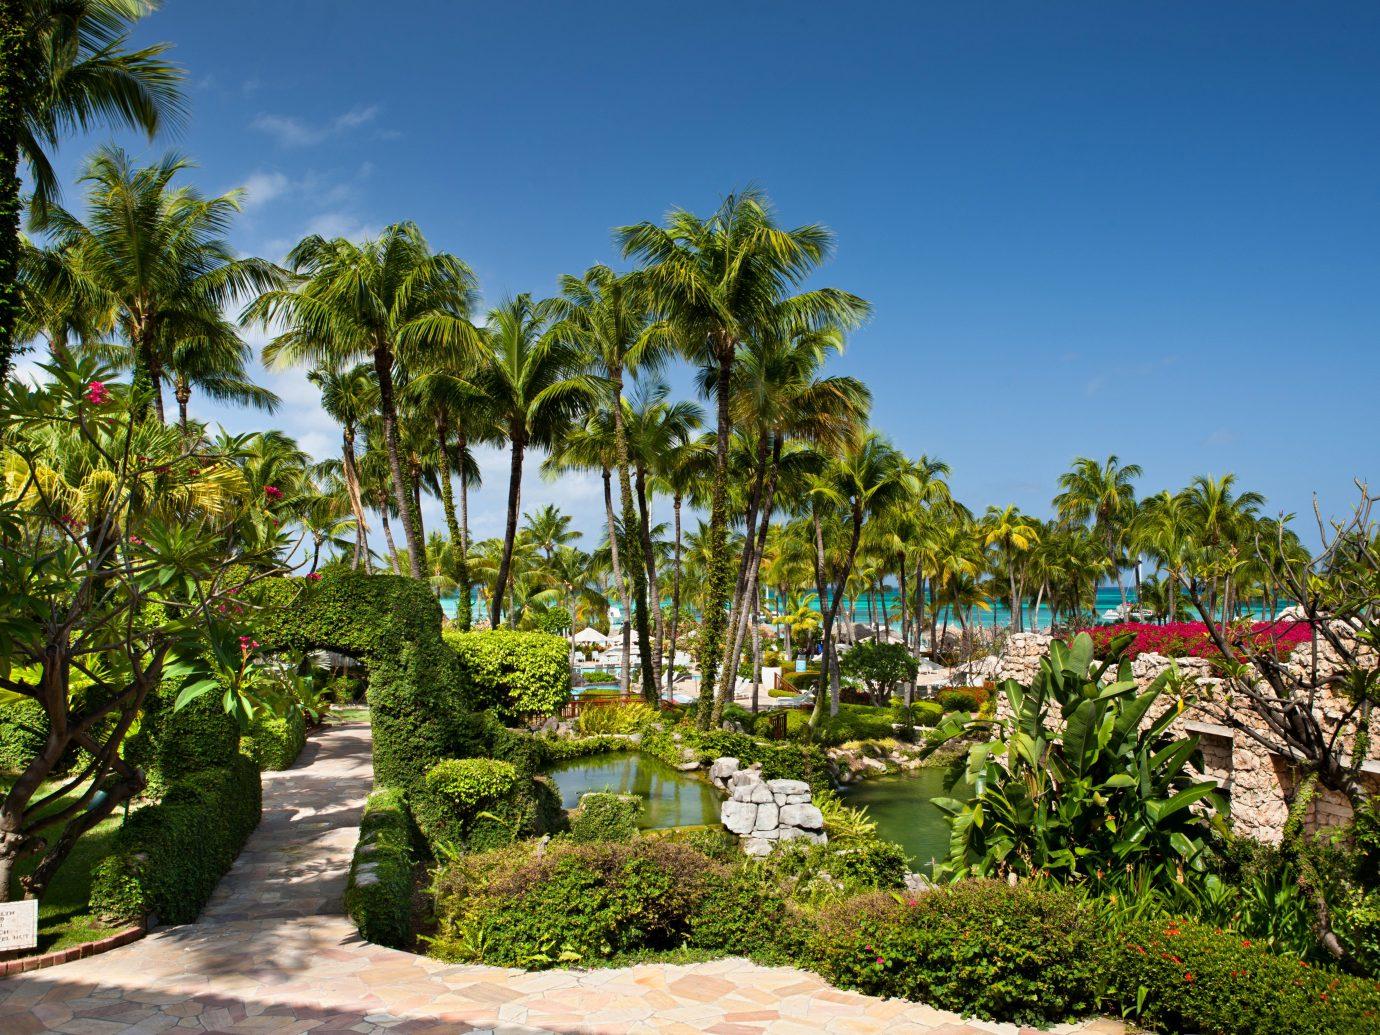 Aruba Beachfront caribbean Casino Classic Grounds Hotels Resort Tropical tree outdoor sky flora ecosystem botany plant Garden arecales flower tropics palm estate palm family botanical garden park Jungle lined